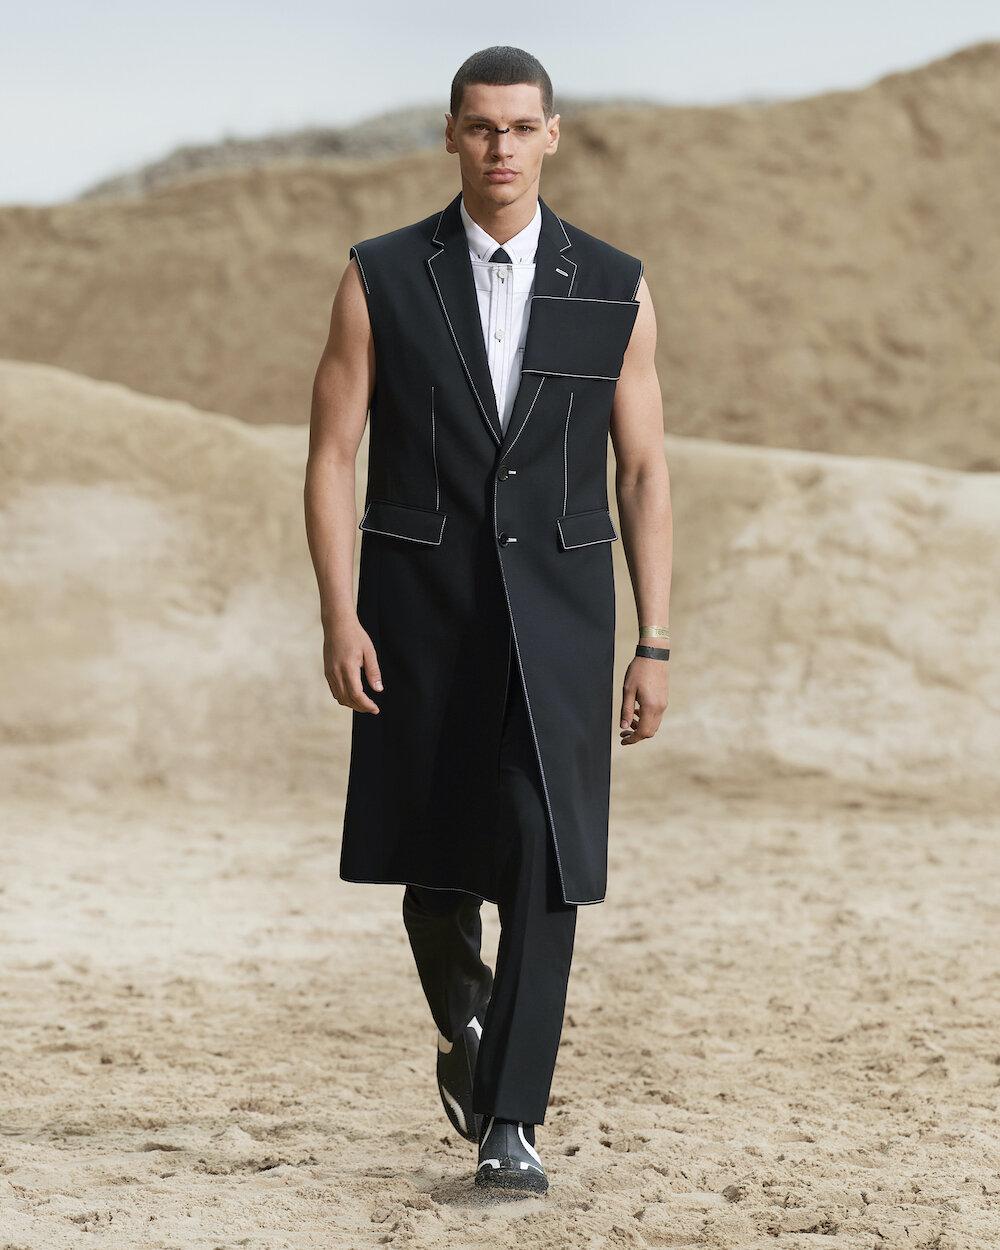 Burberry Spring_Summer 2022 Menswear Presentation Collection - Look 8 - Alvaro.jpg